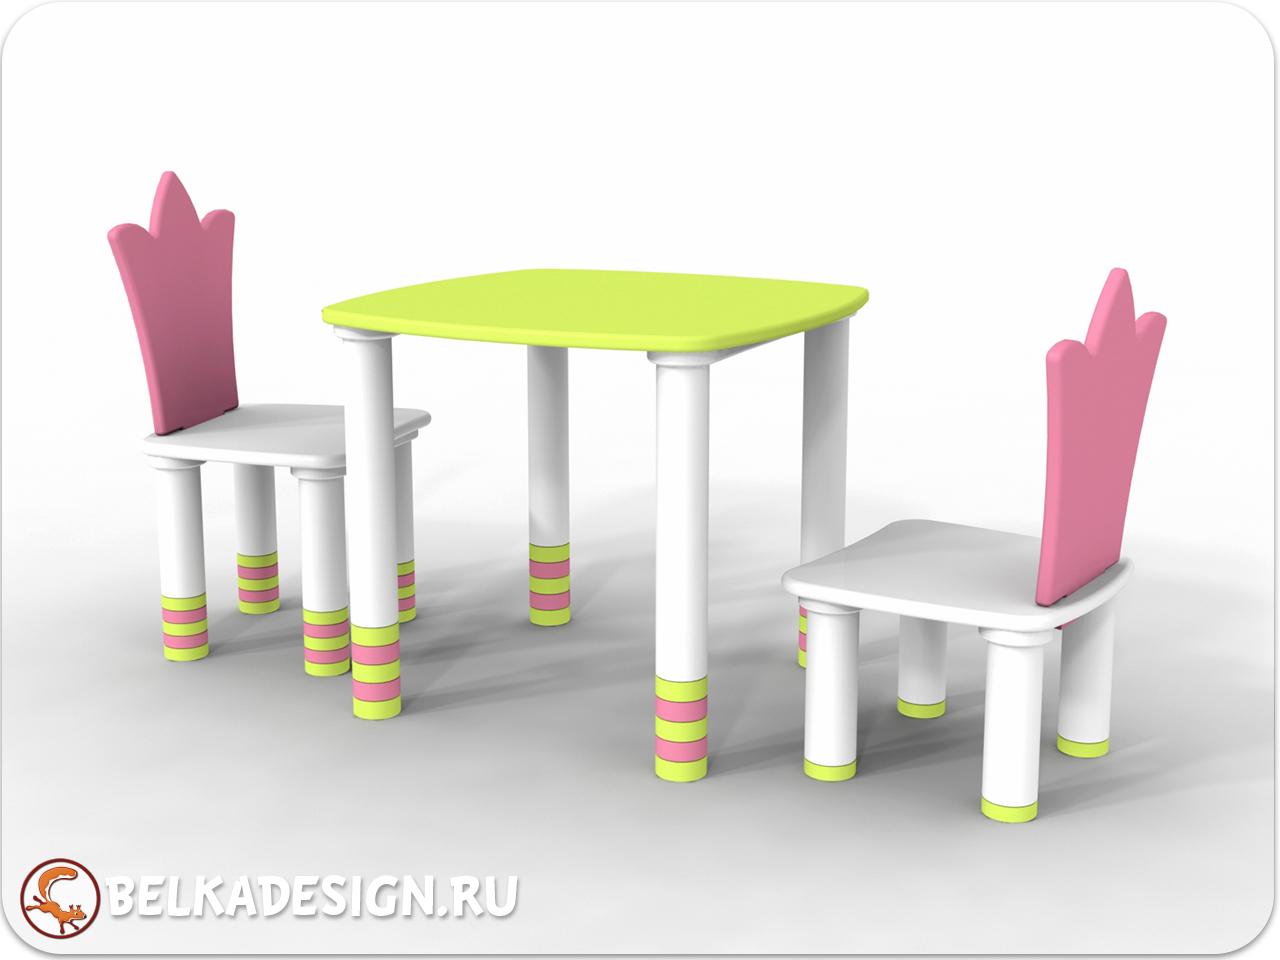 Стол и стул растущие